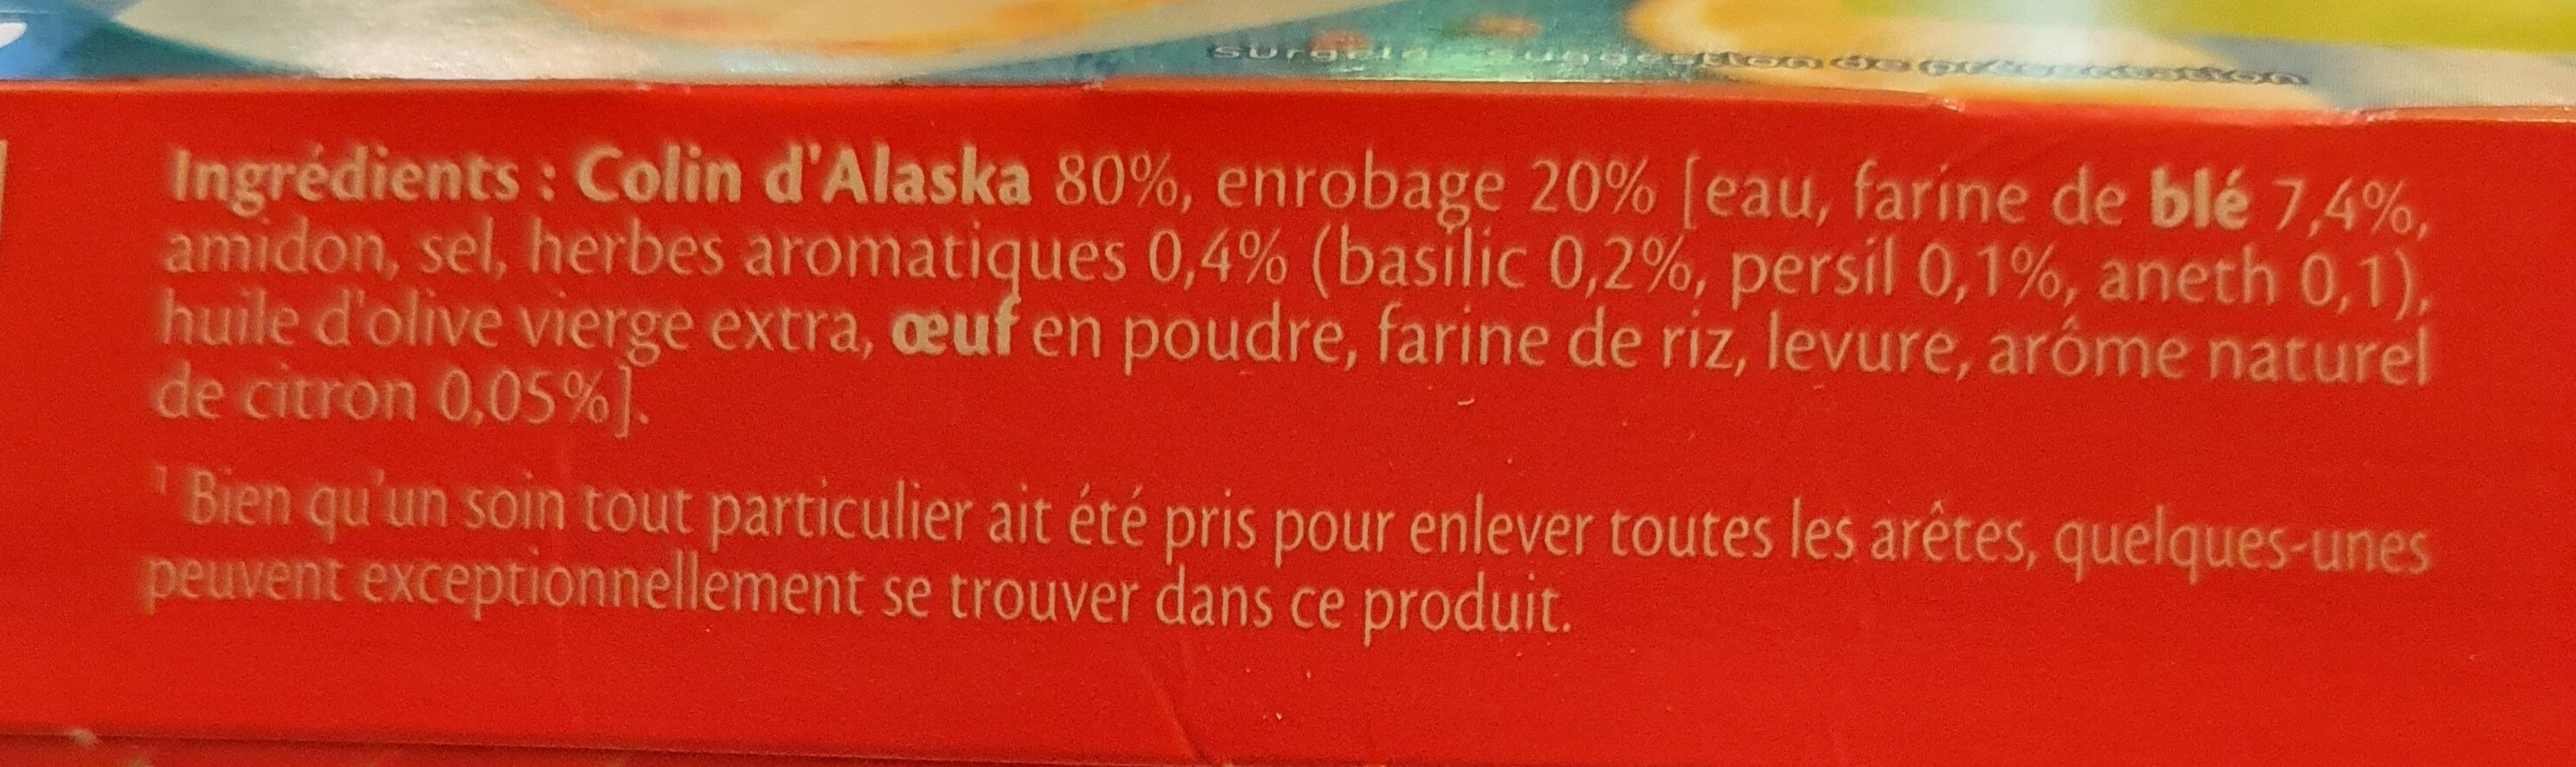 Filets de colin d'Alaska citron herbes fines - Ingrediënten - fr